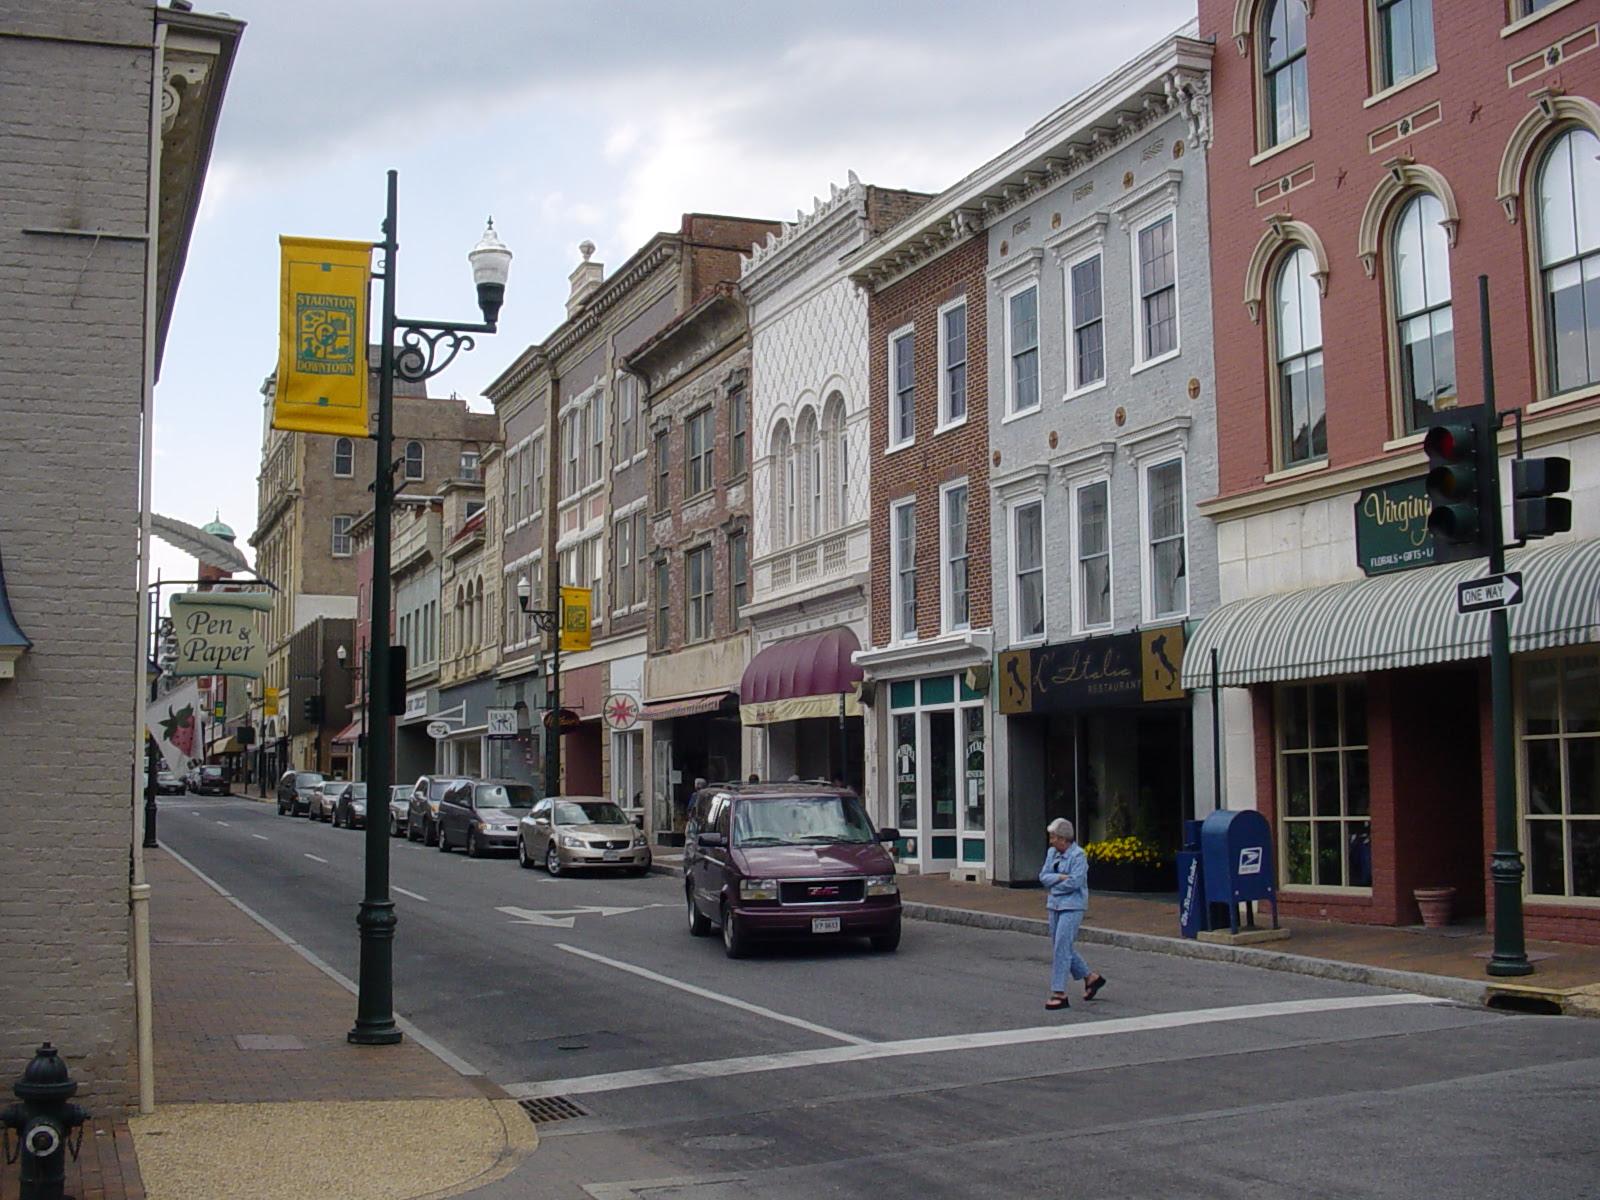 Bird's eye view of Staunton, Commonwealth of Virginia